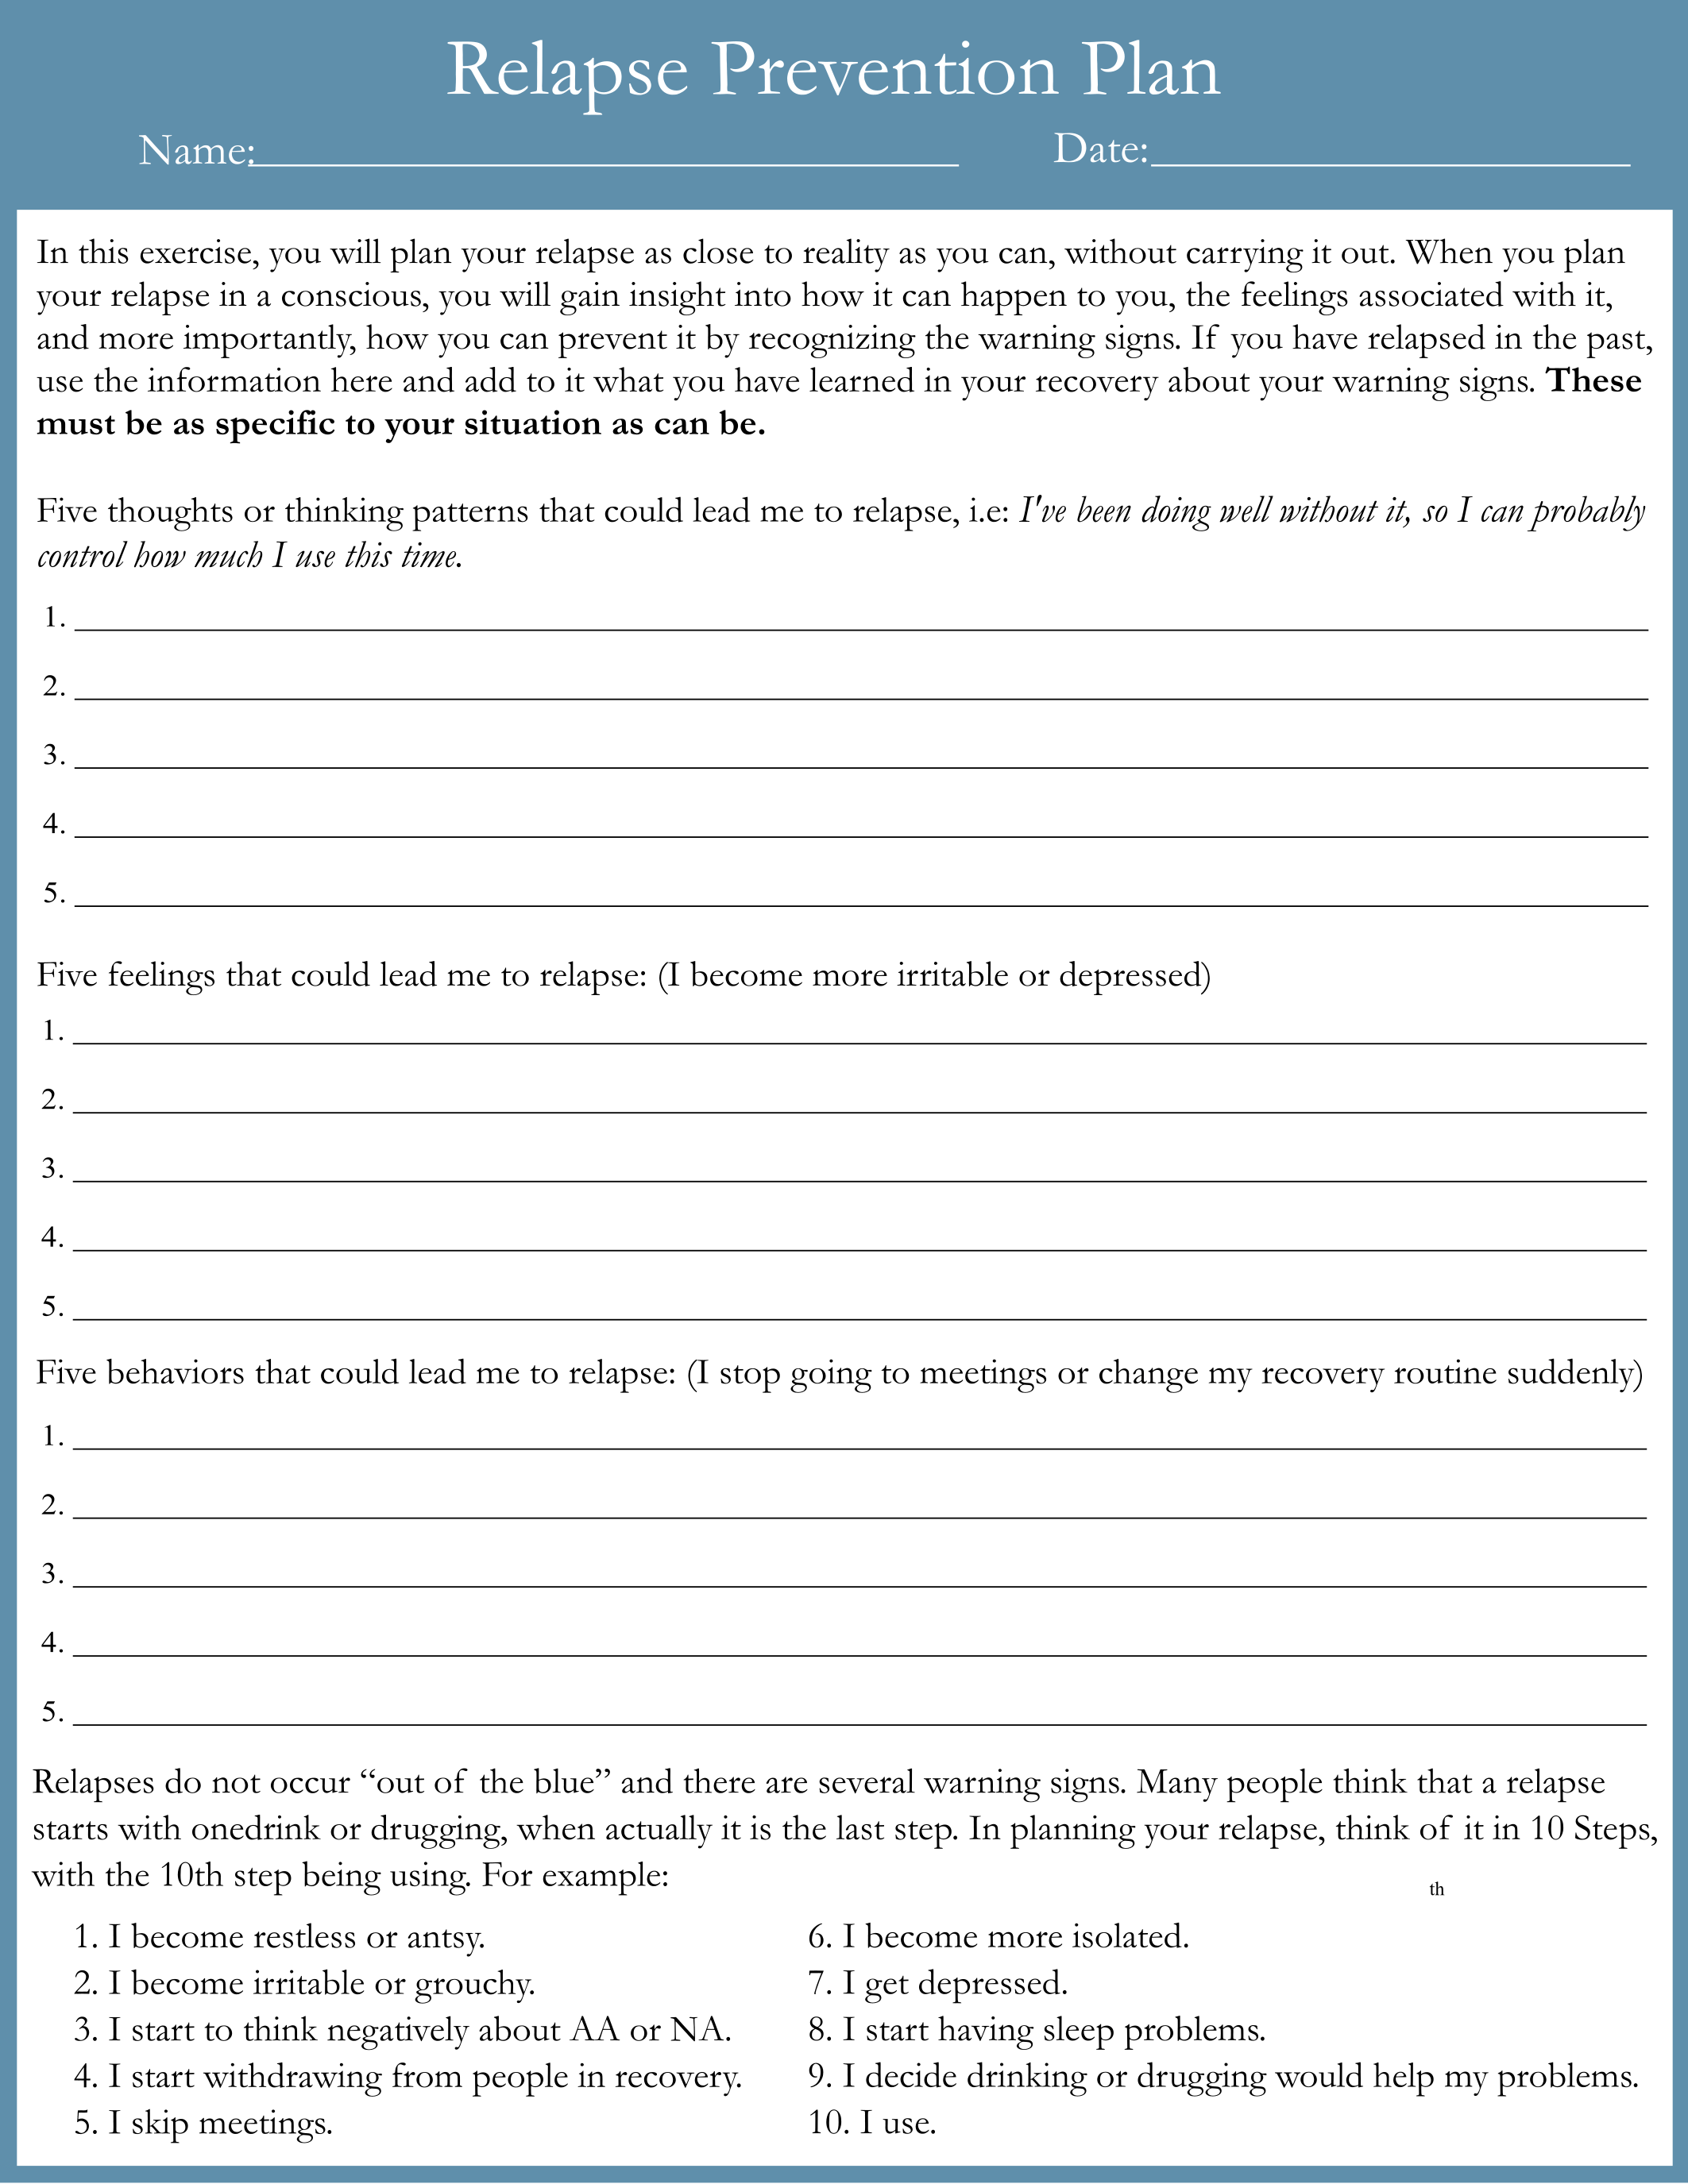 Relapse Prevention Workbook Pdf